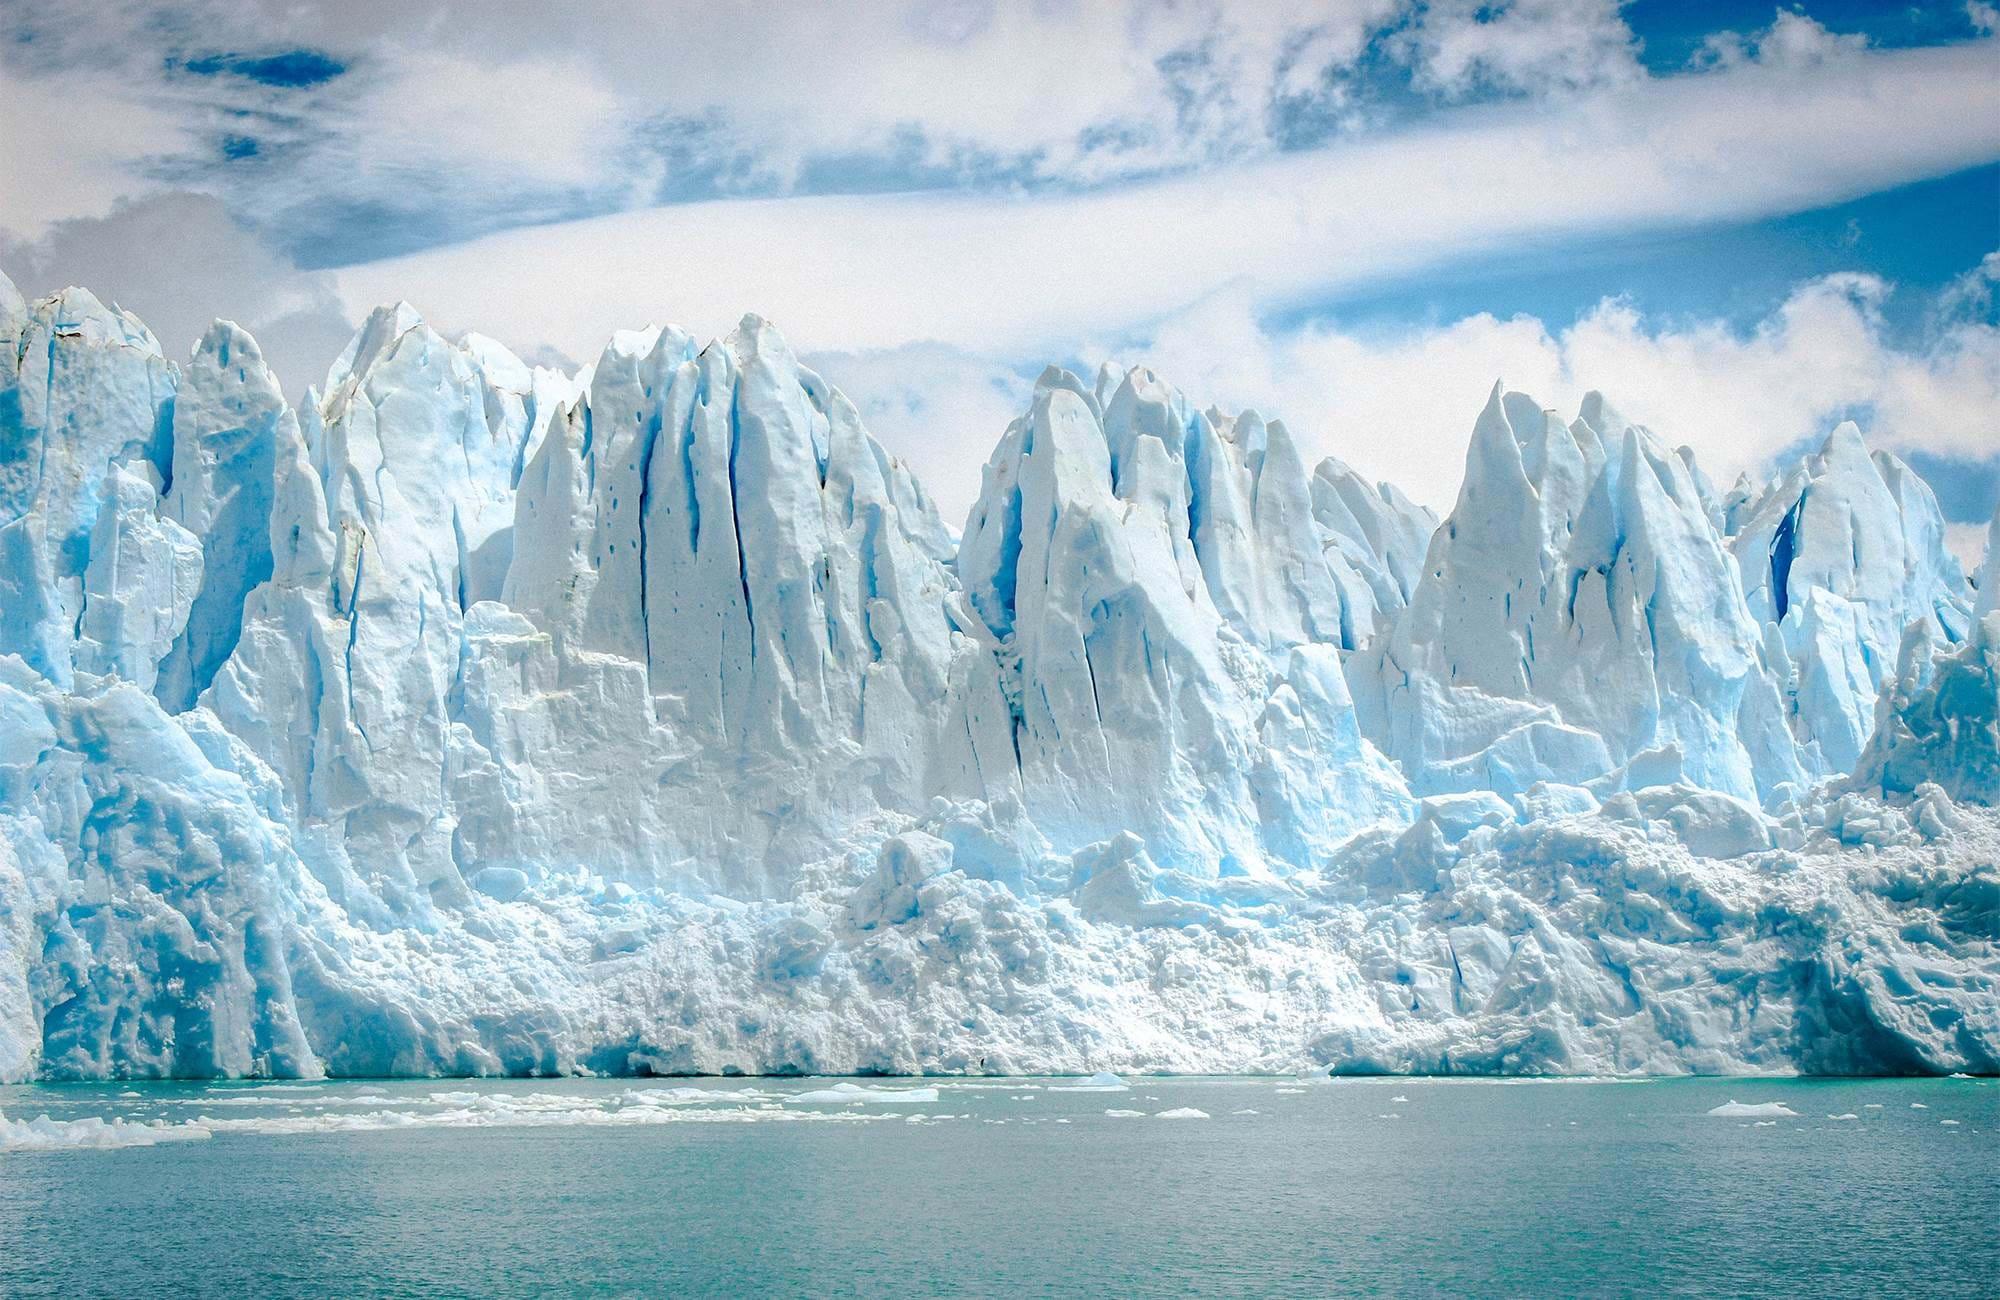 antarctic-glaciers